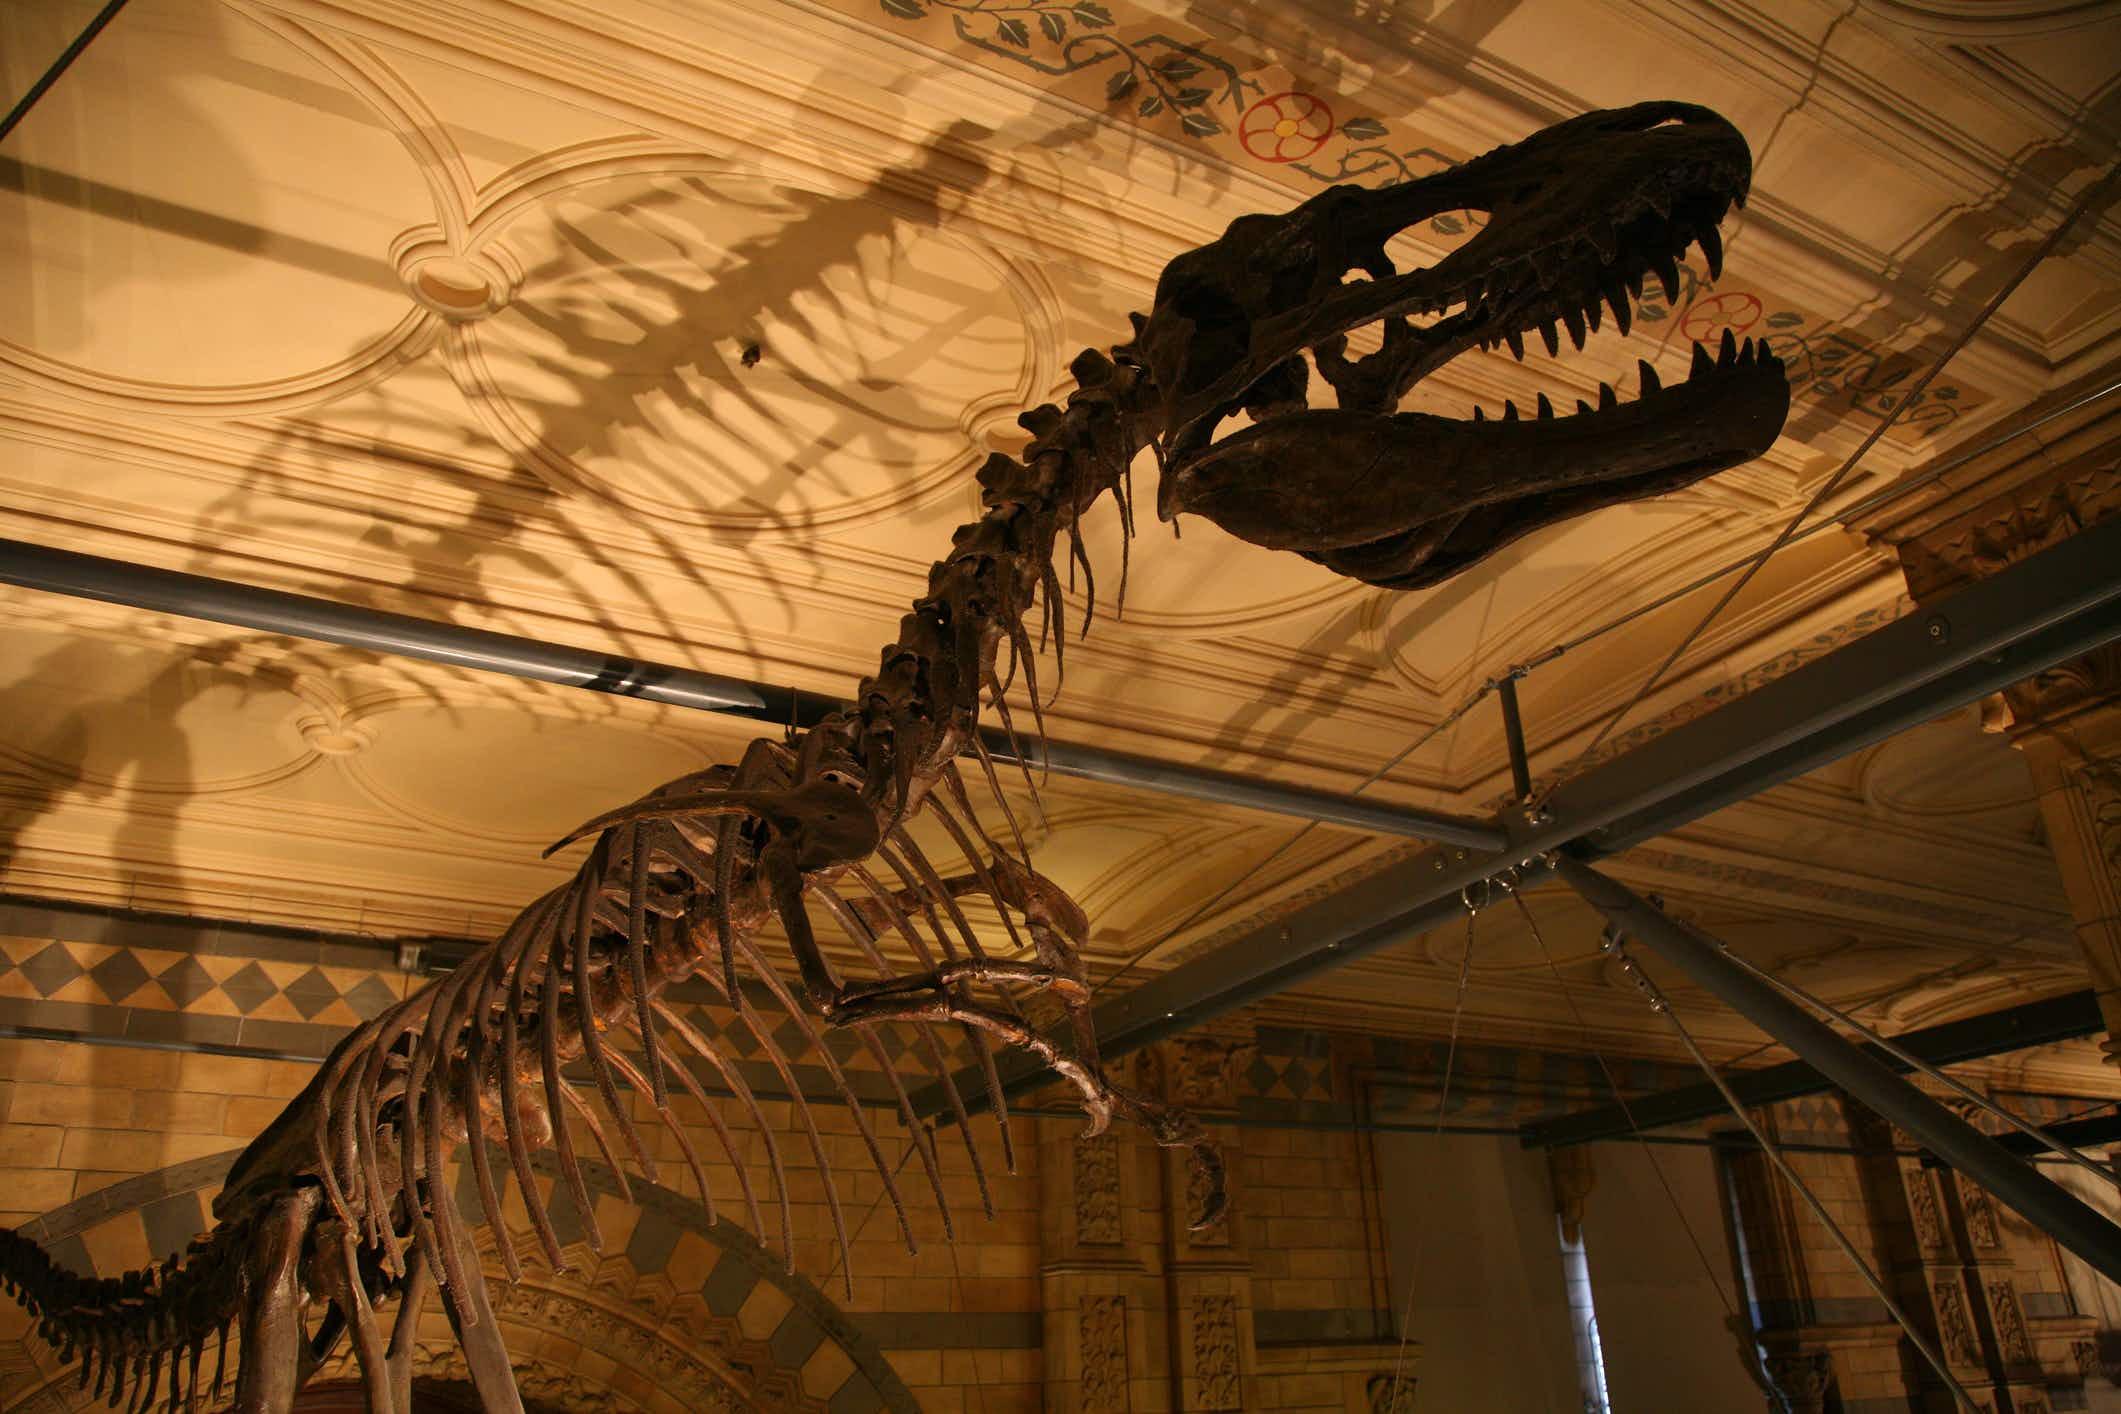 Ten-year-old boy spots dinosaur error at London's Natural History Museum